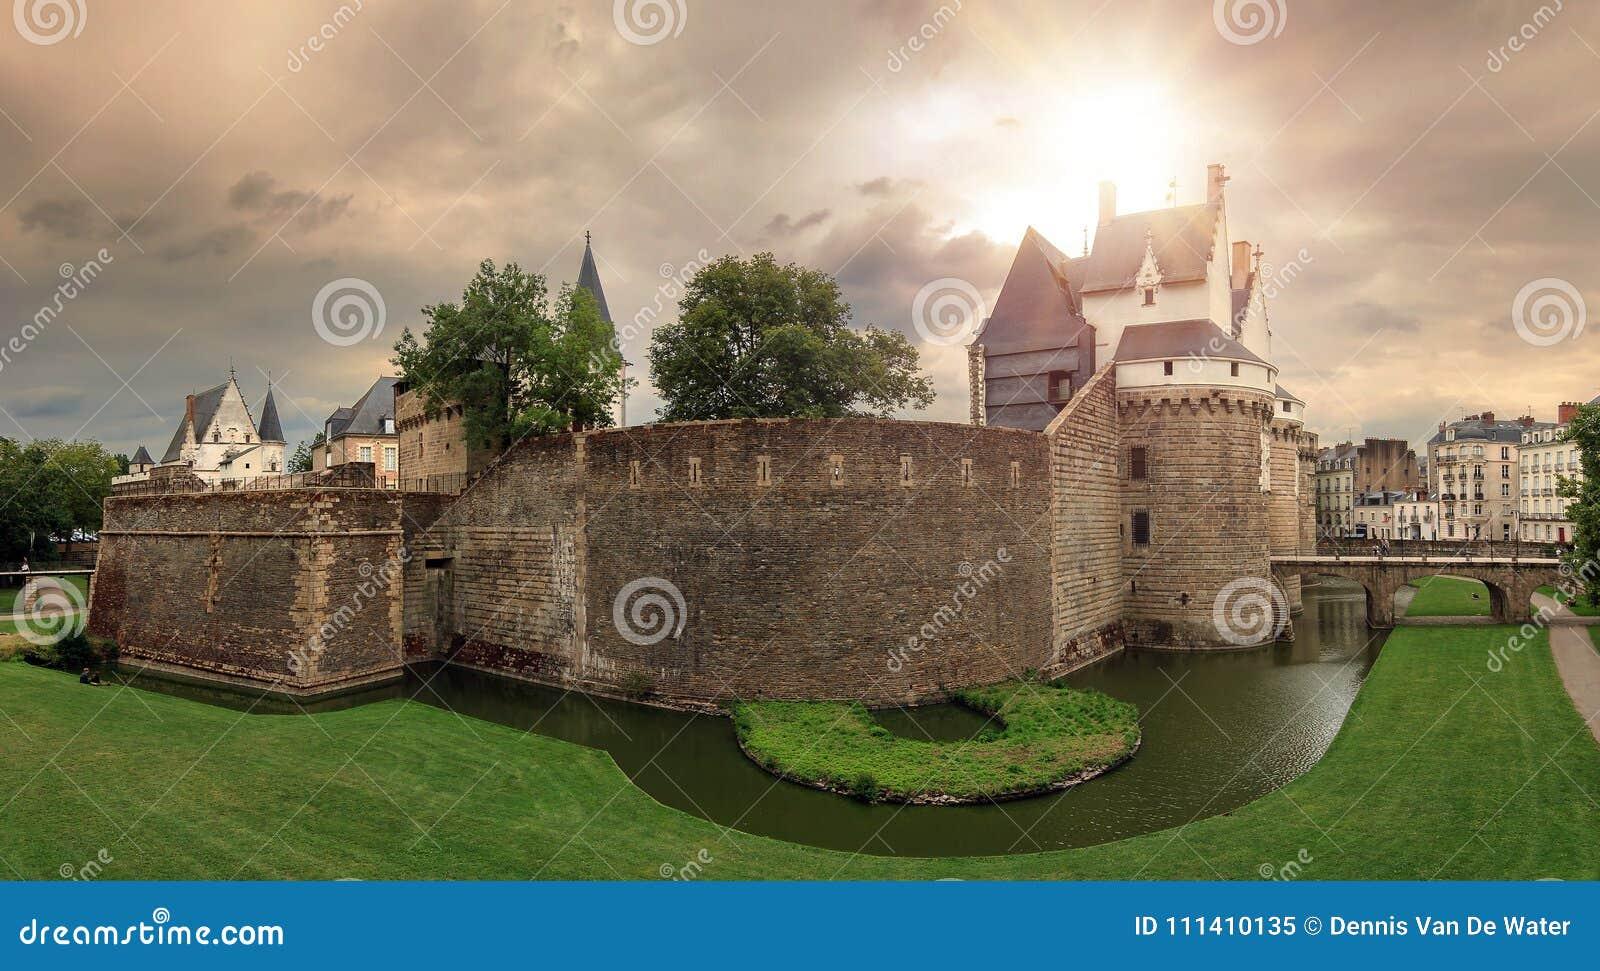 Nantes castle ominous sky panorama